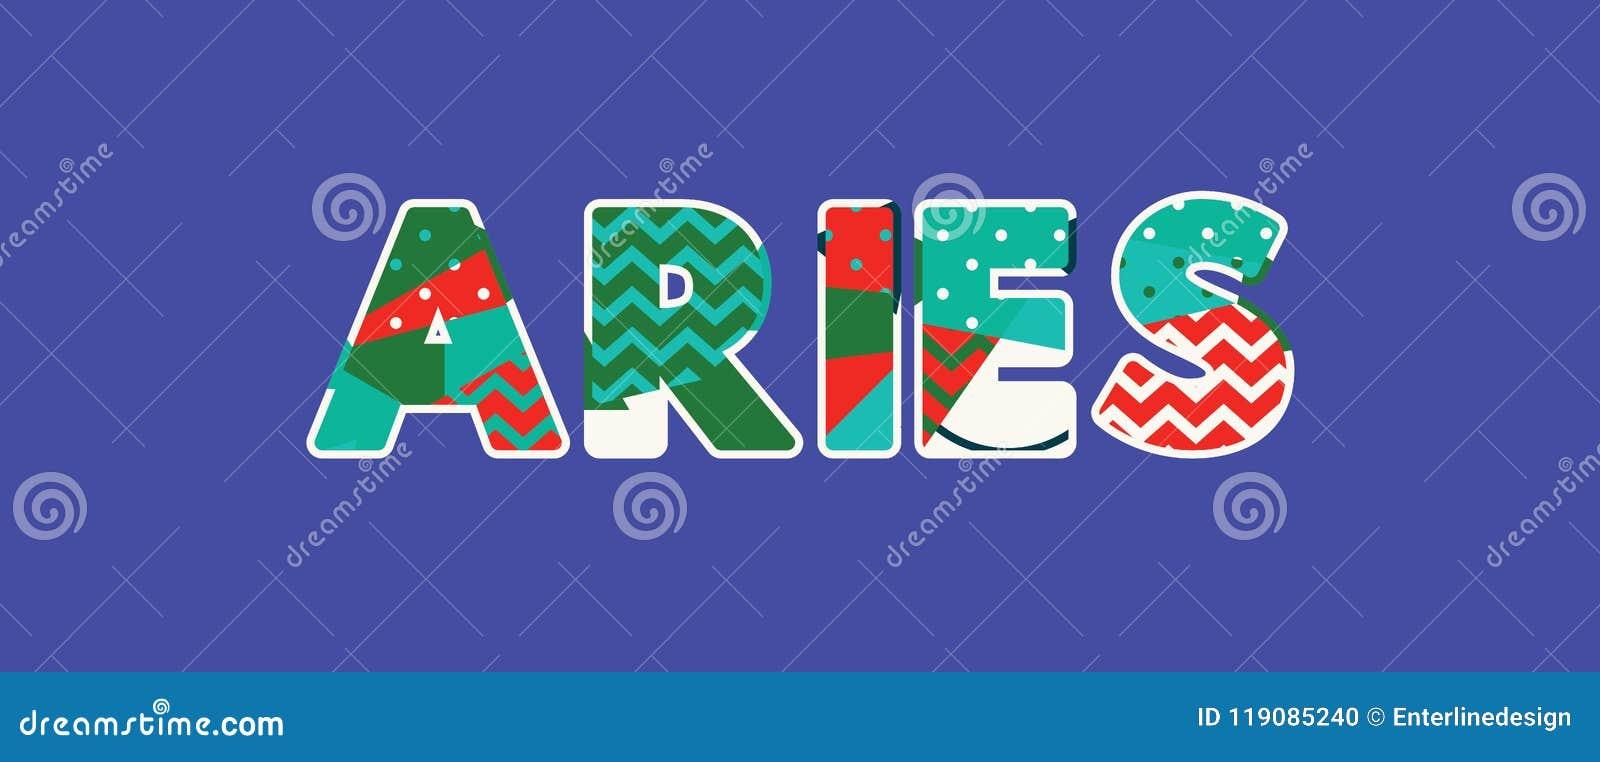 Aries Concept Word Art Illustration